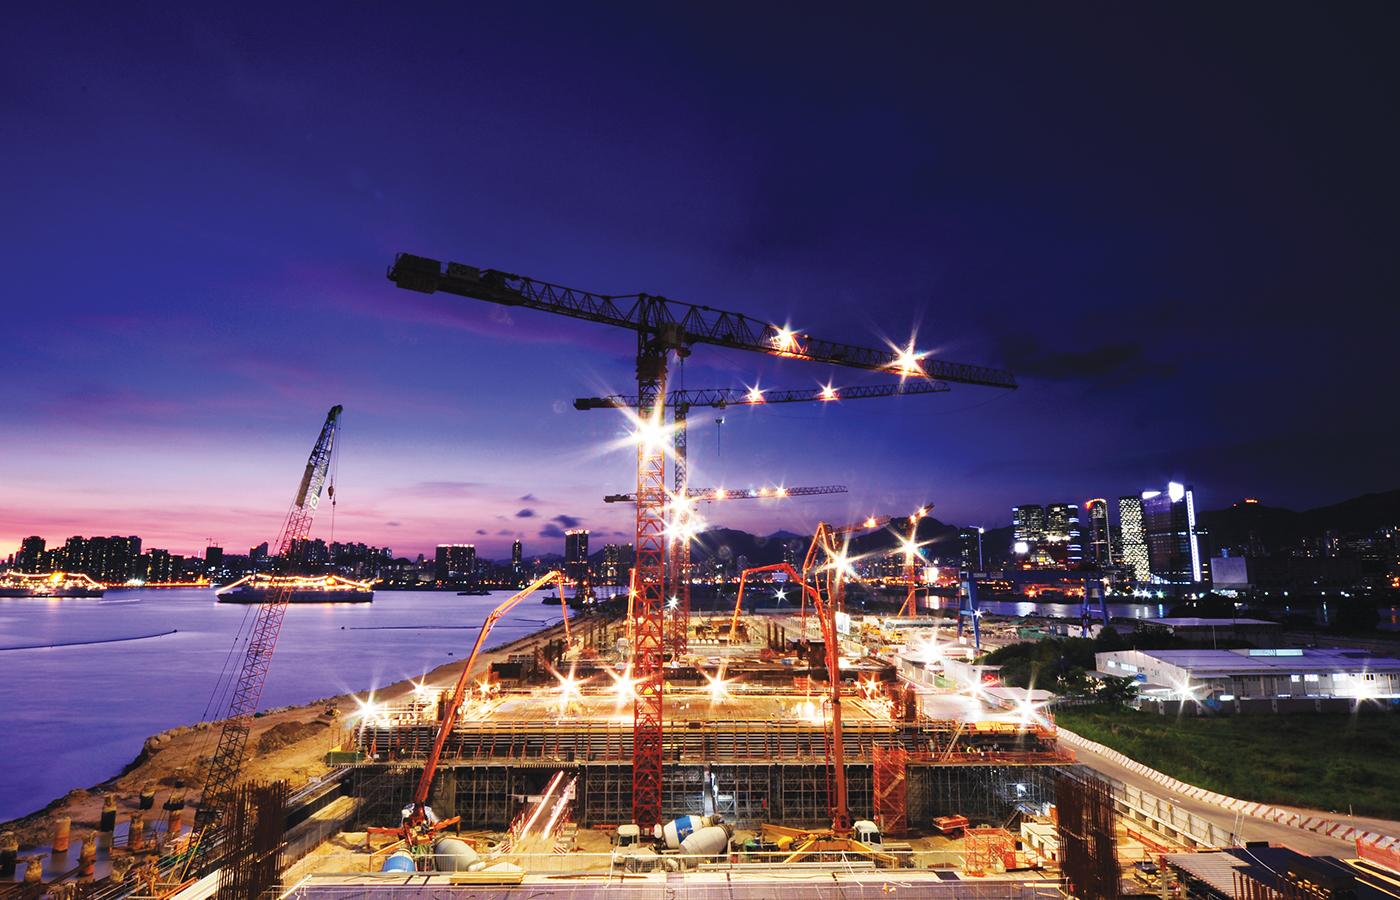 Hong Kong Kai Tak Cruise Terminal - USING AQUAMEXOIL RELEASE AGENT